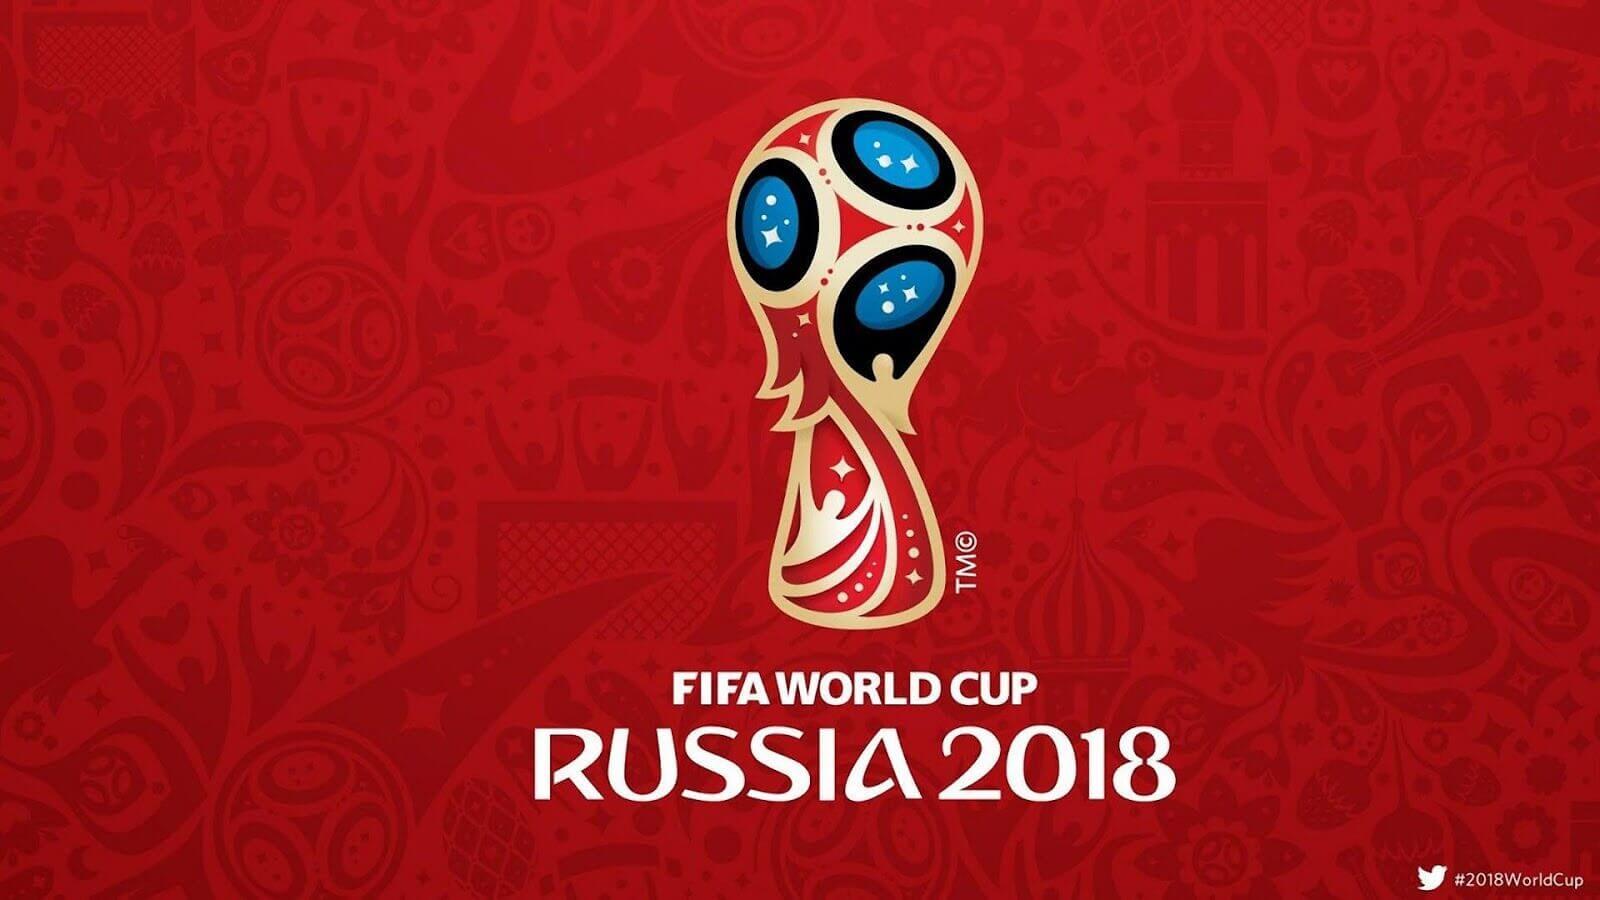 jadwal lengkap piala dunia rusia 2018